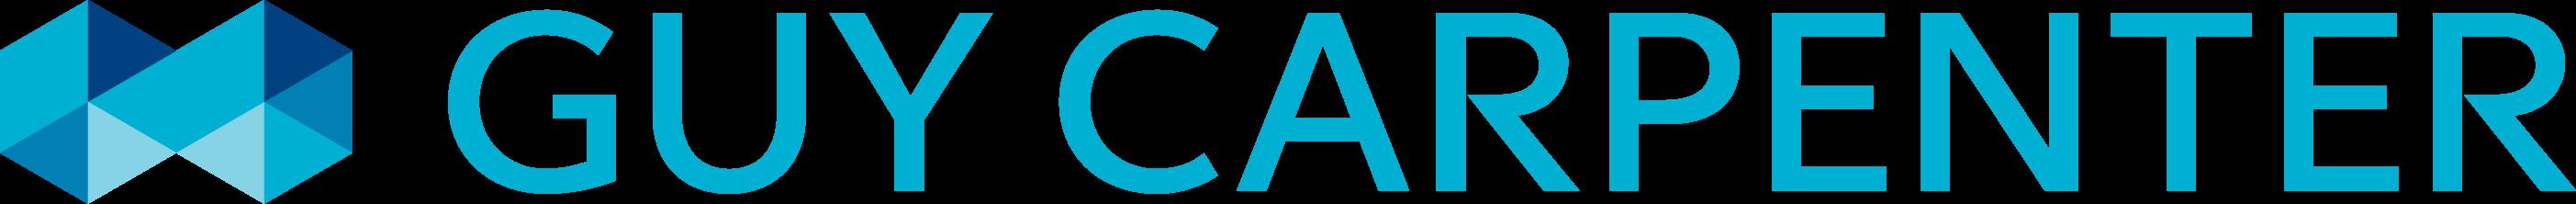 Guy Carpenter Logo_HiRes